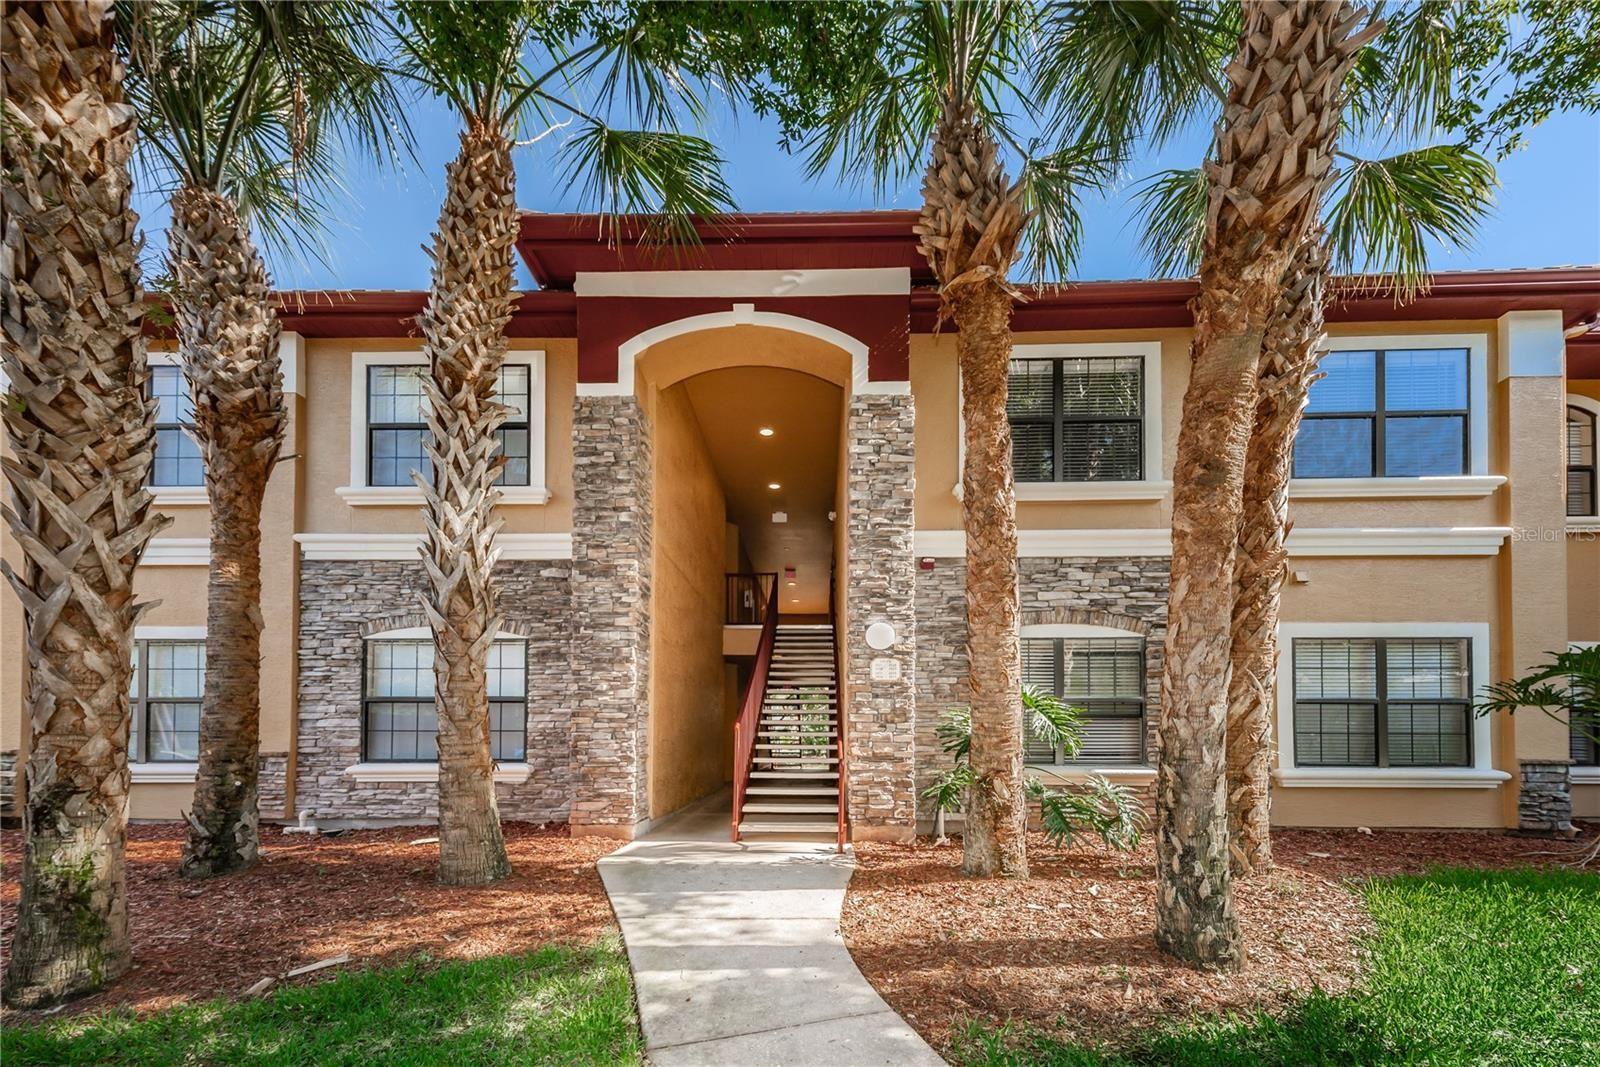 2249 PORTOFINO PLACE #2216, Palm Harbor, FL 34683 - #: U8129200